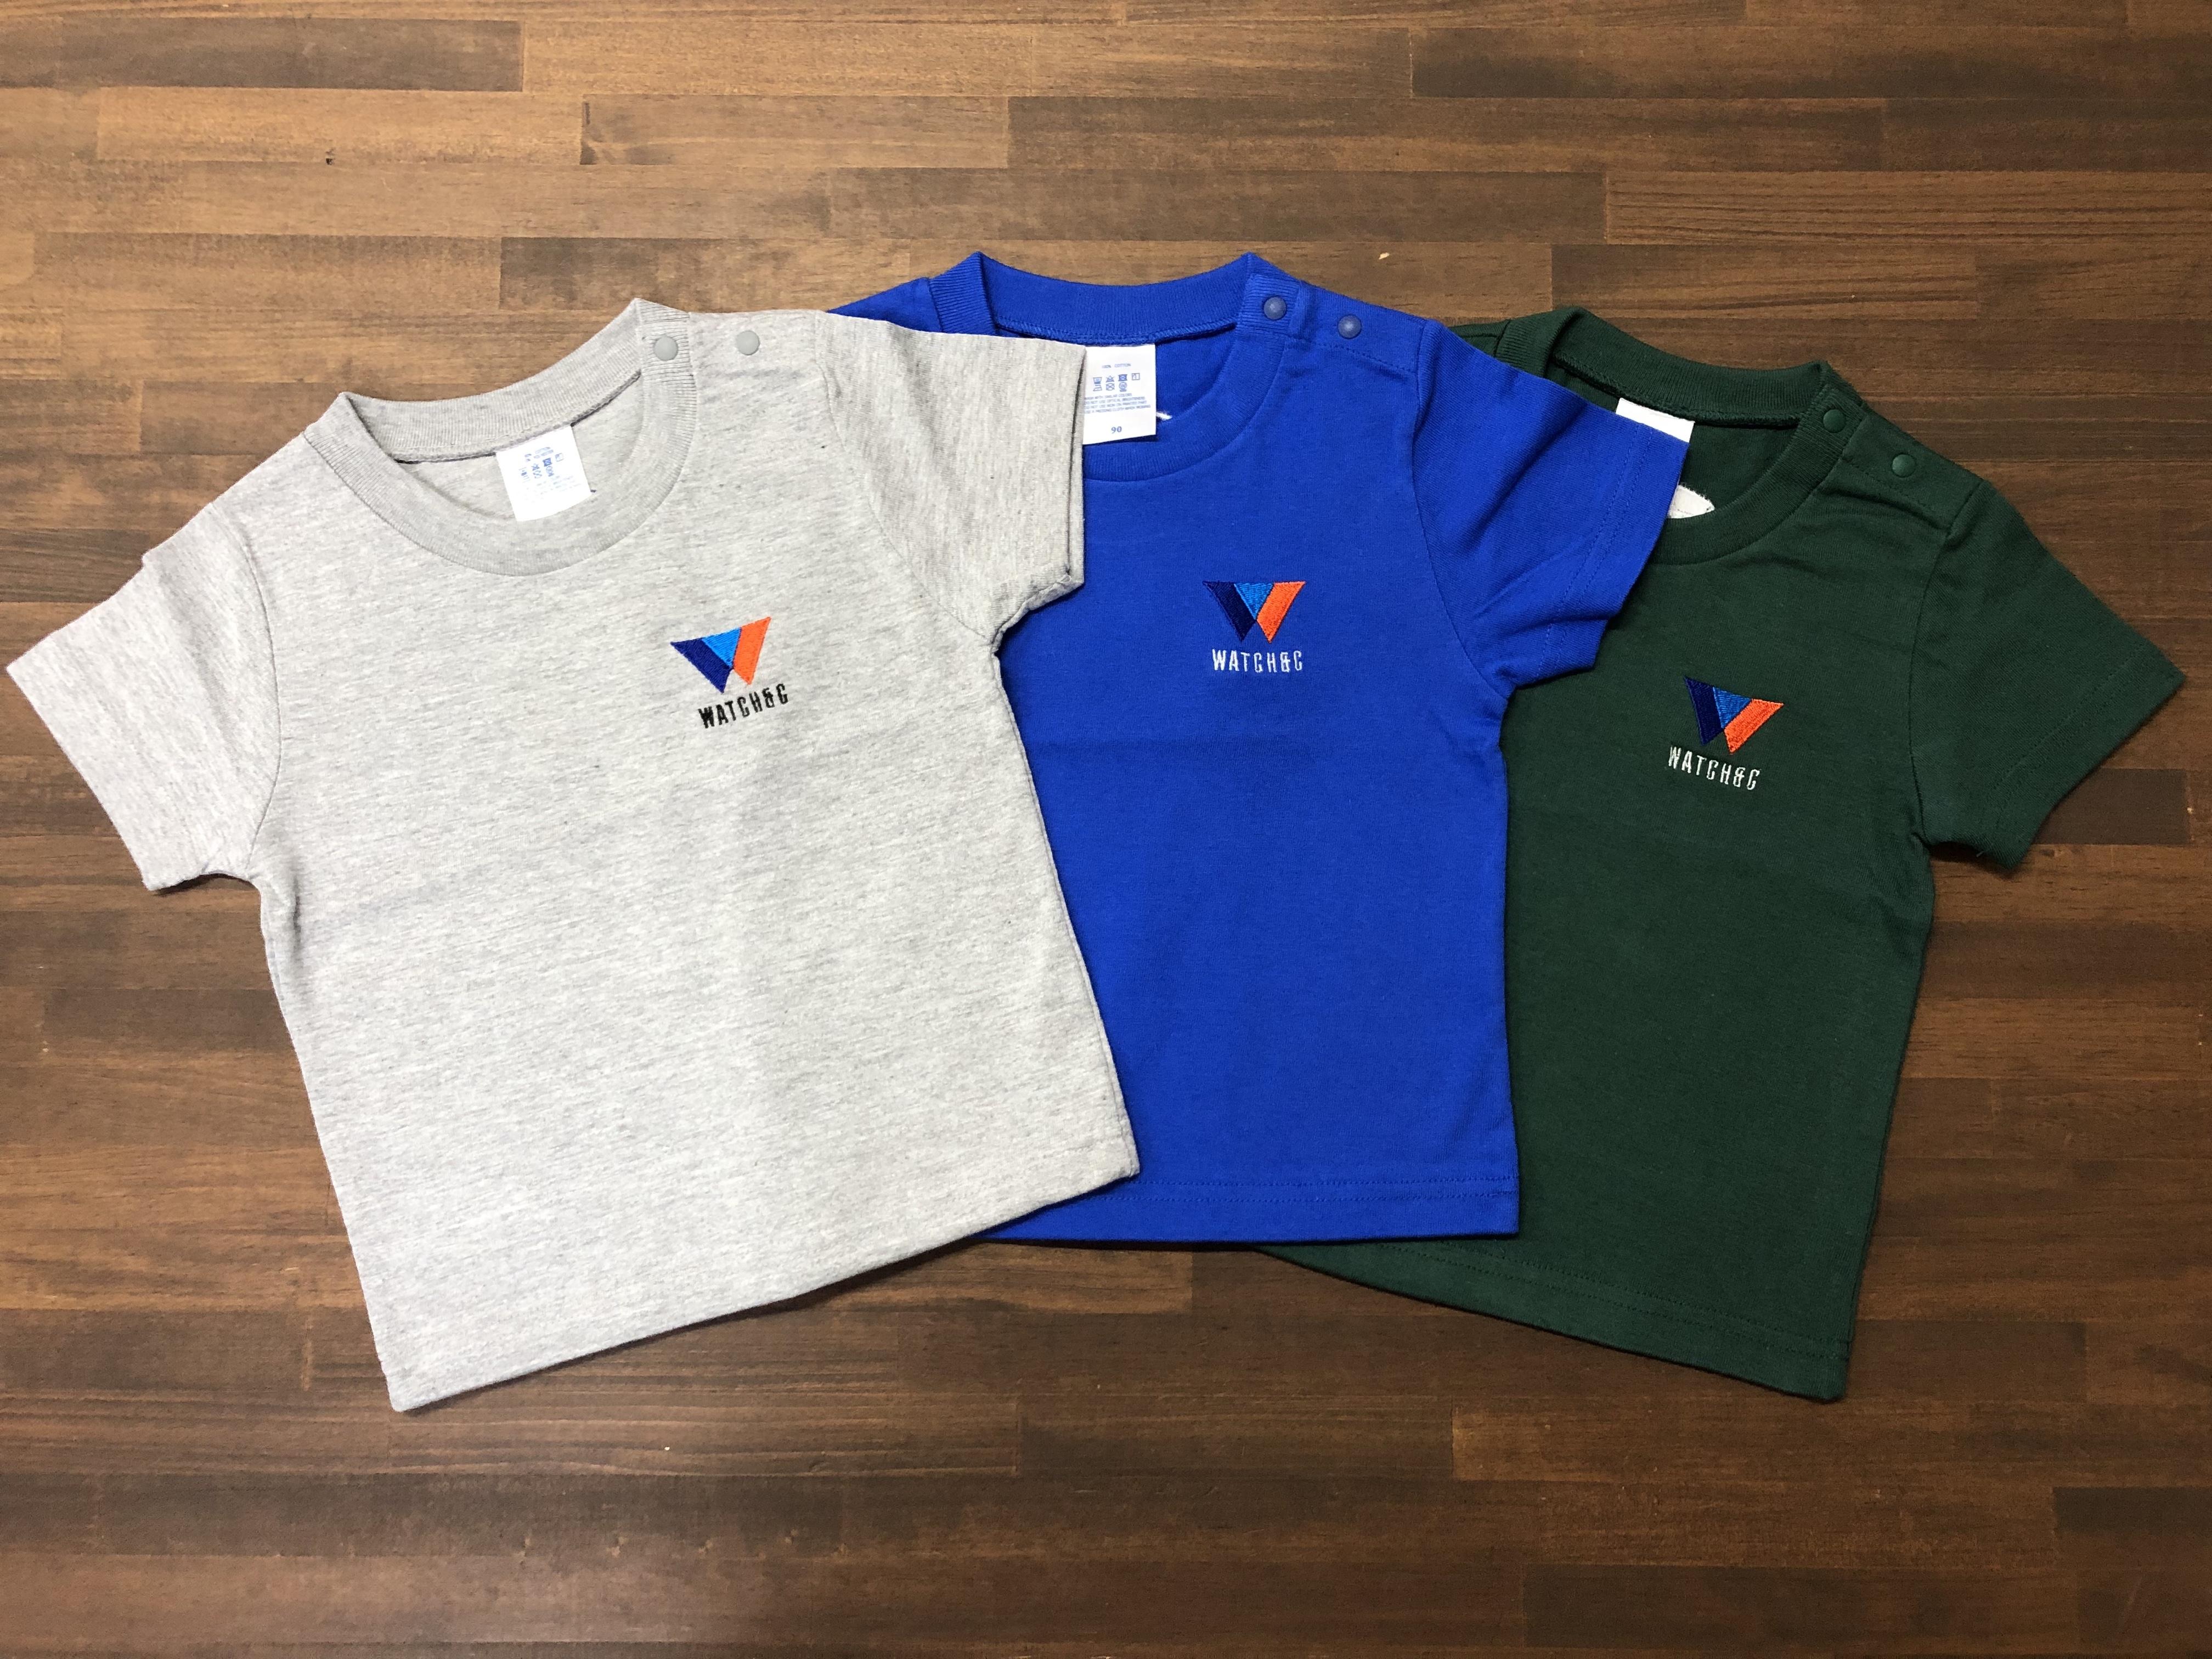 Hoopnsk × WATCH&C コラボ企画第1弾 キッズTシャツ